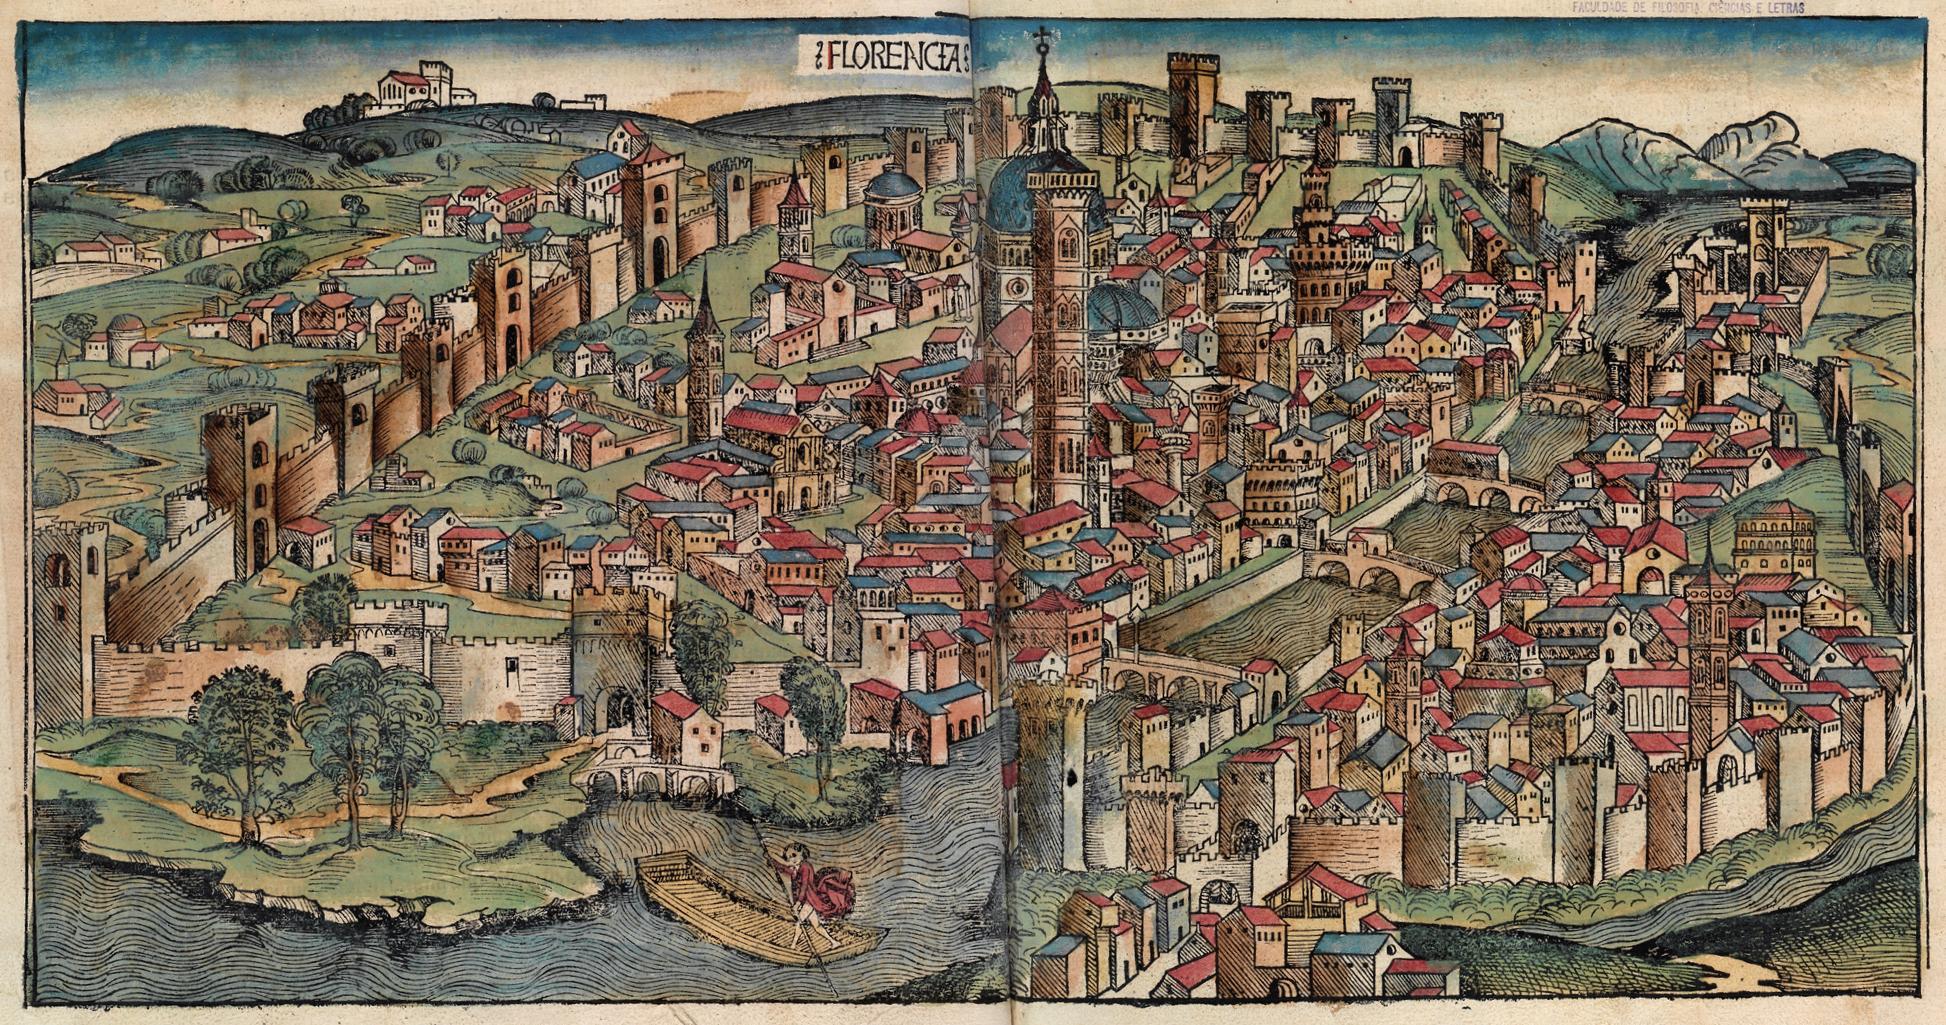 Florencia   Qu Medievo  Pinterest  Renaissance